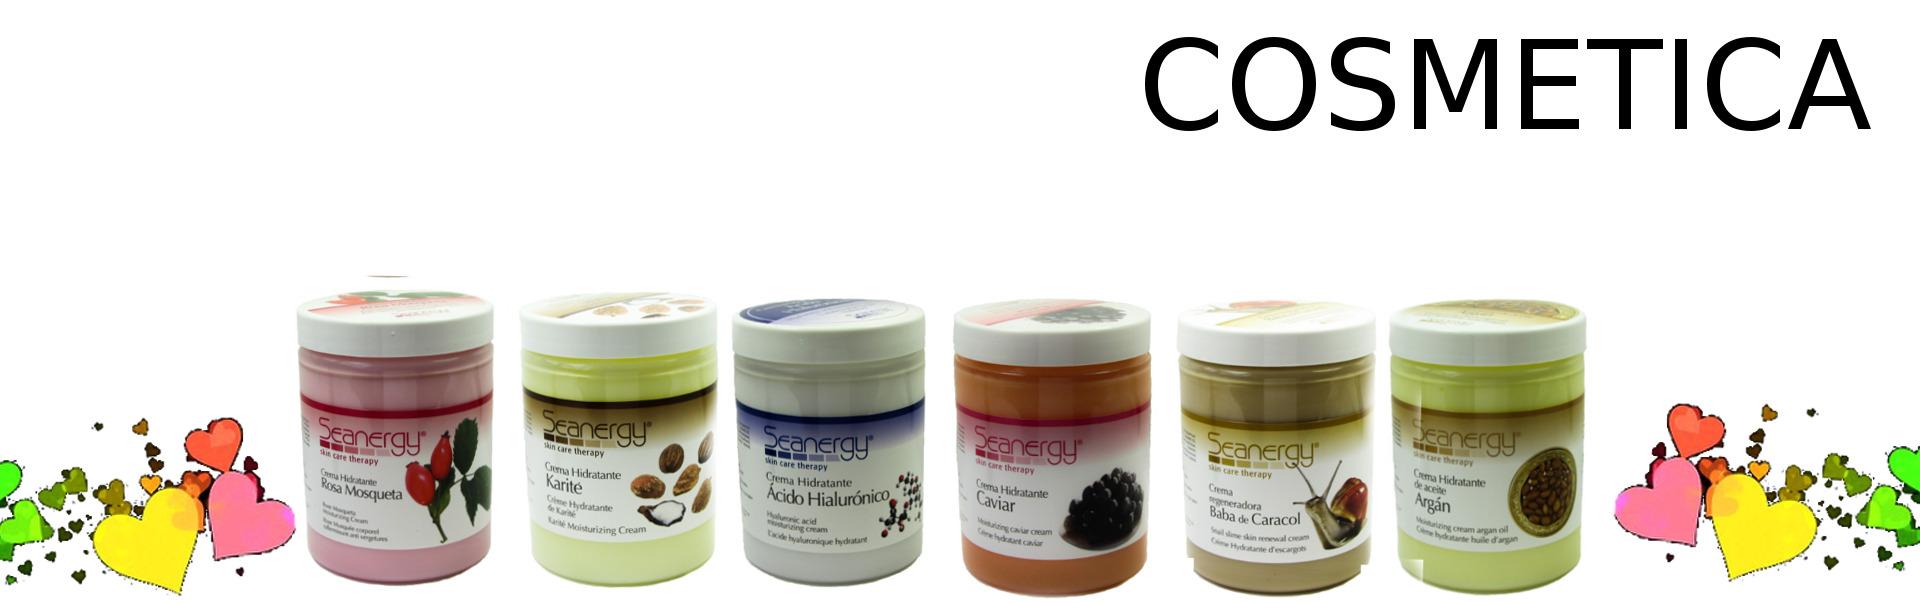 Cosmética natural - masfragancias - cosmetica - perfumes imitación - perfumes baratos - perfumes para él